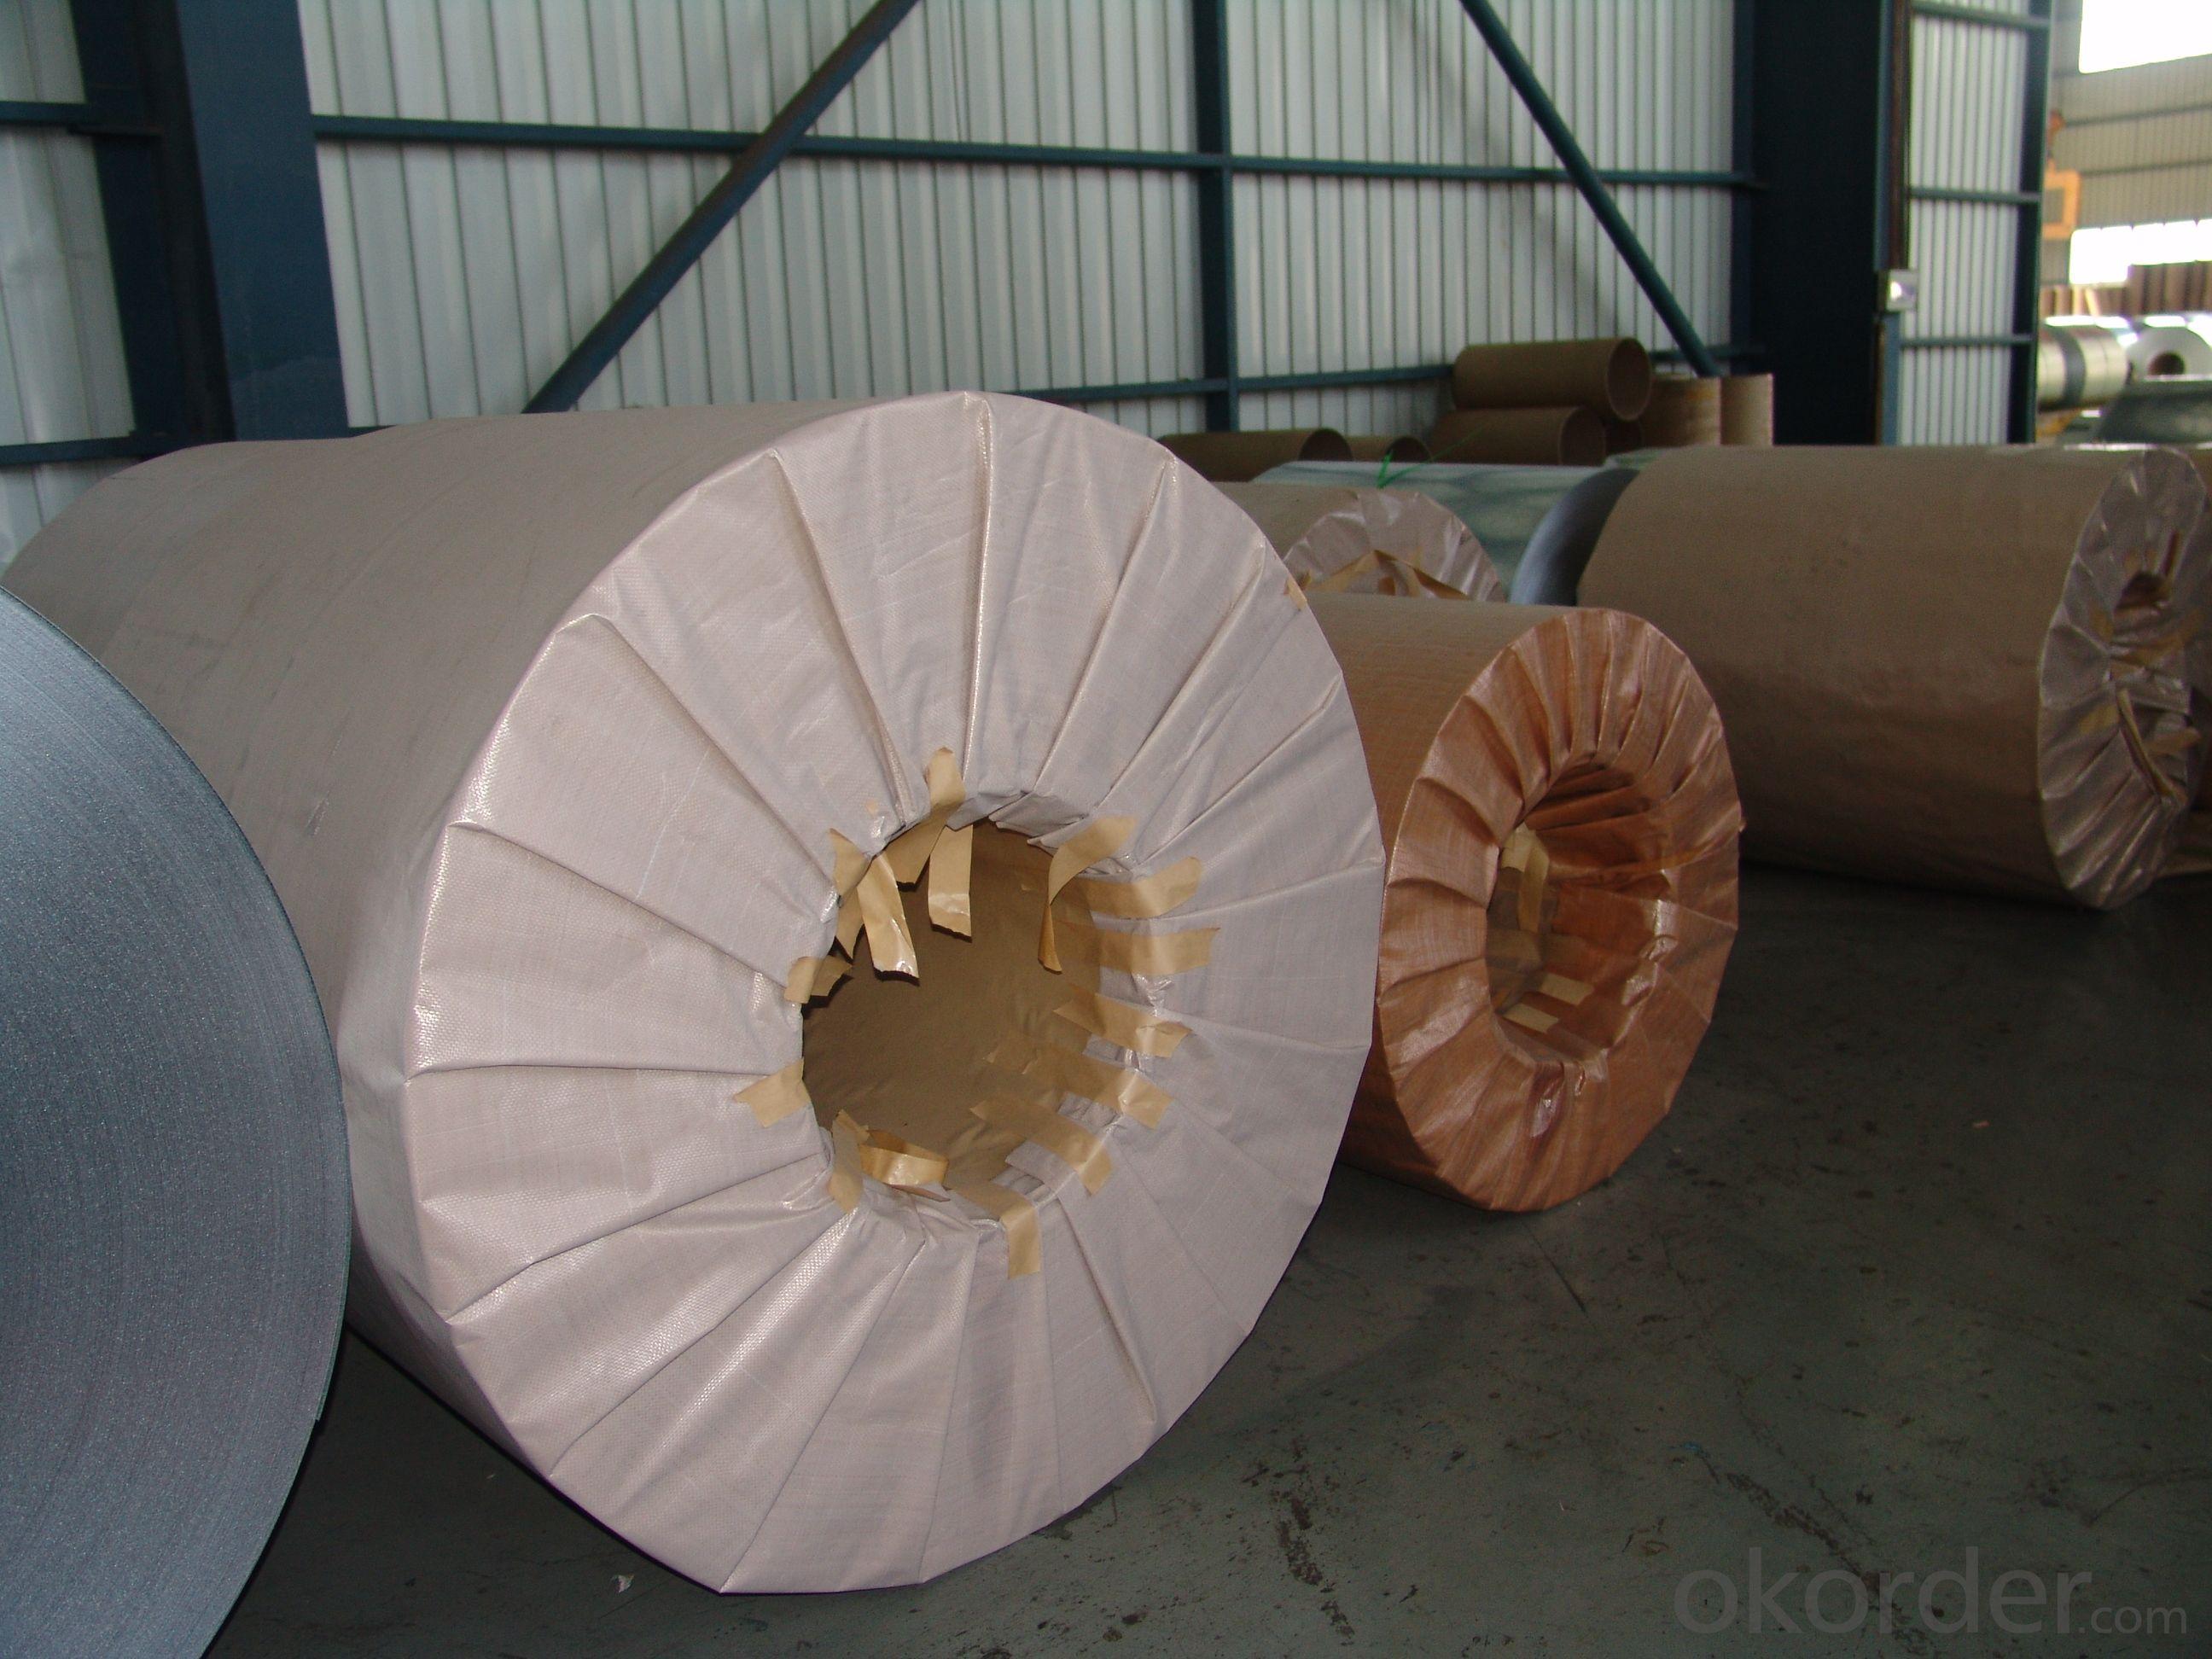 Hot Dipped Galvanized Steel Coil/Sheet-JIS G 3302 SGCC